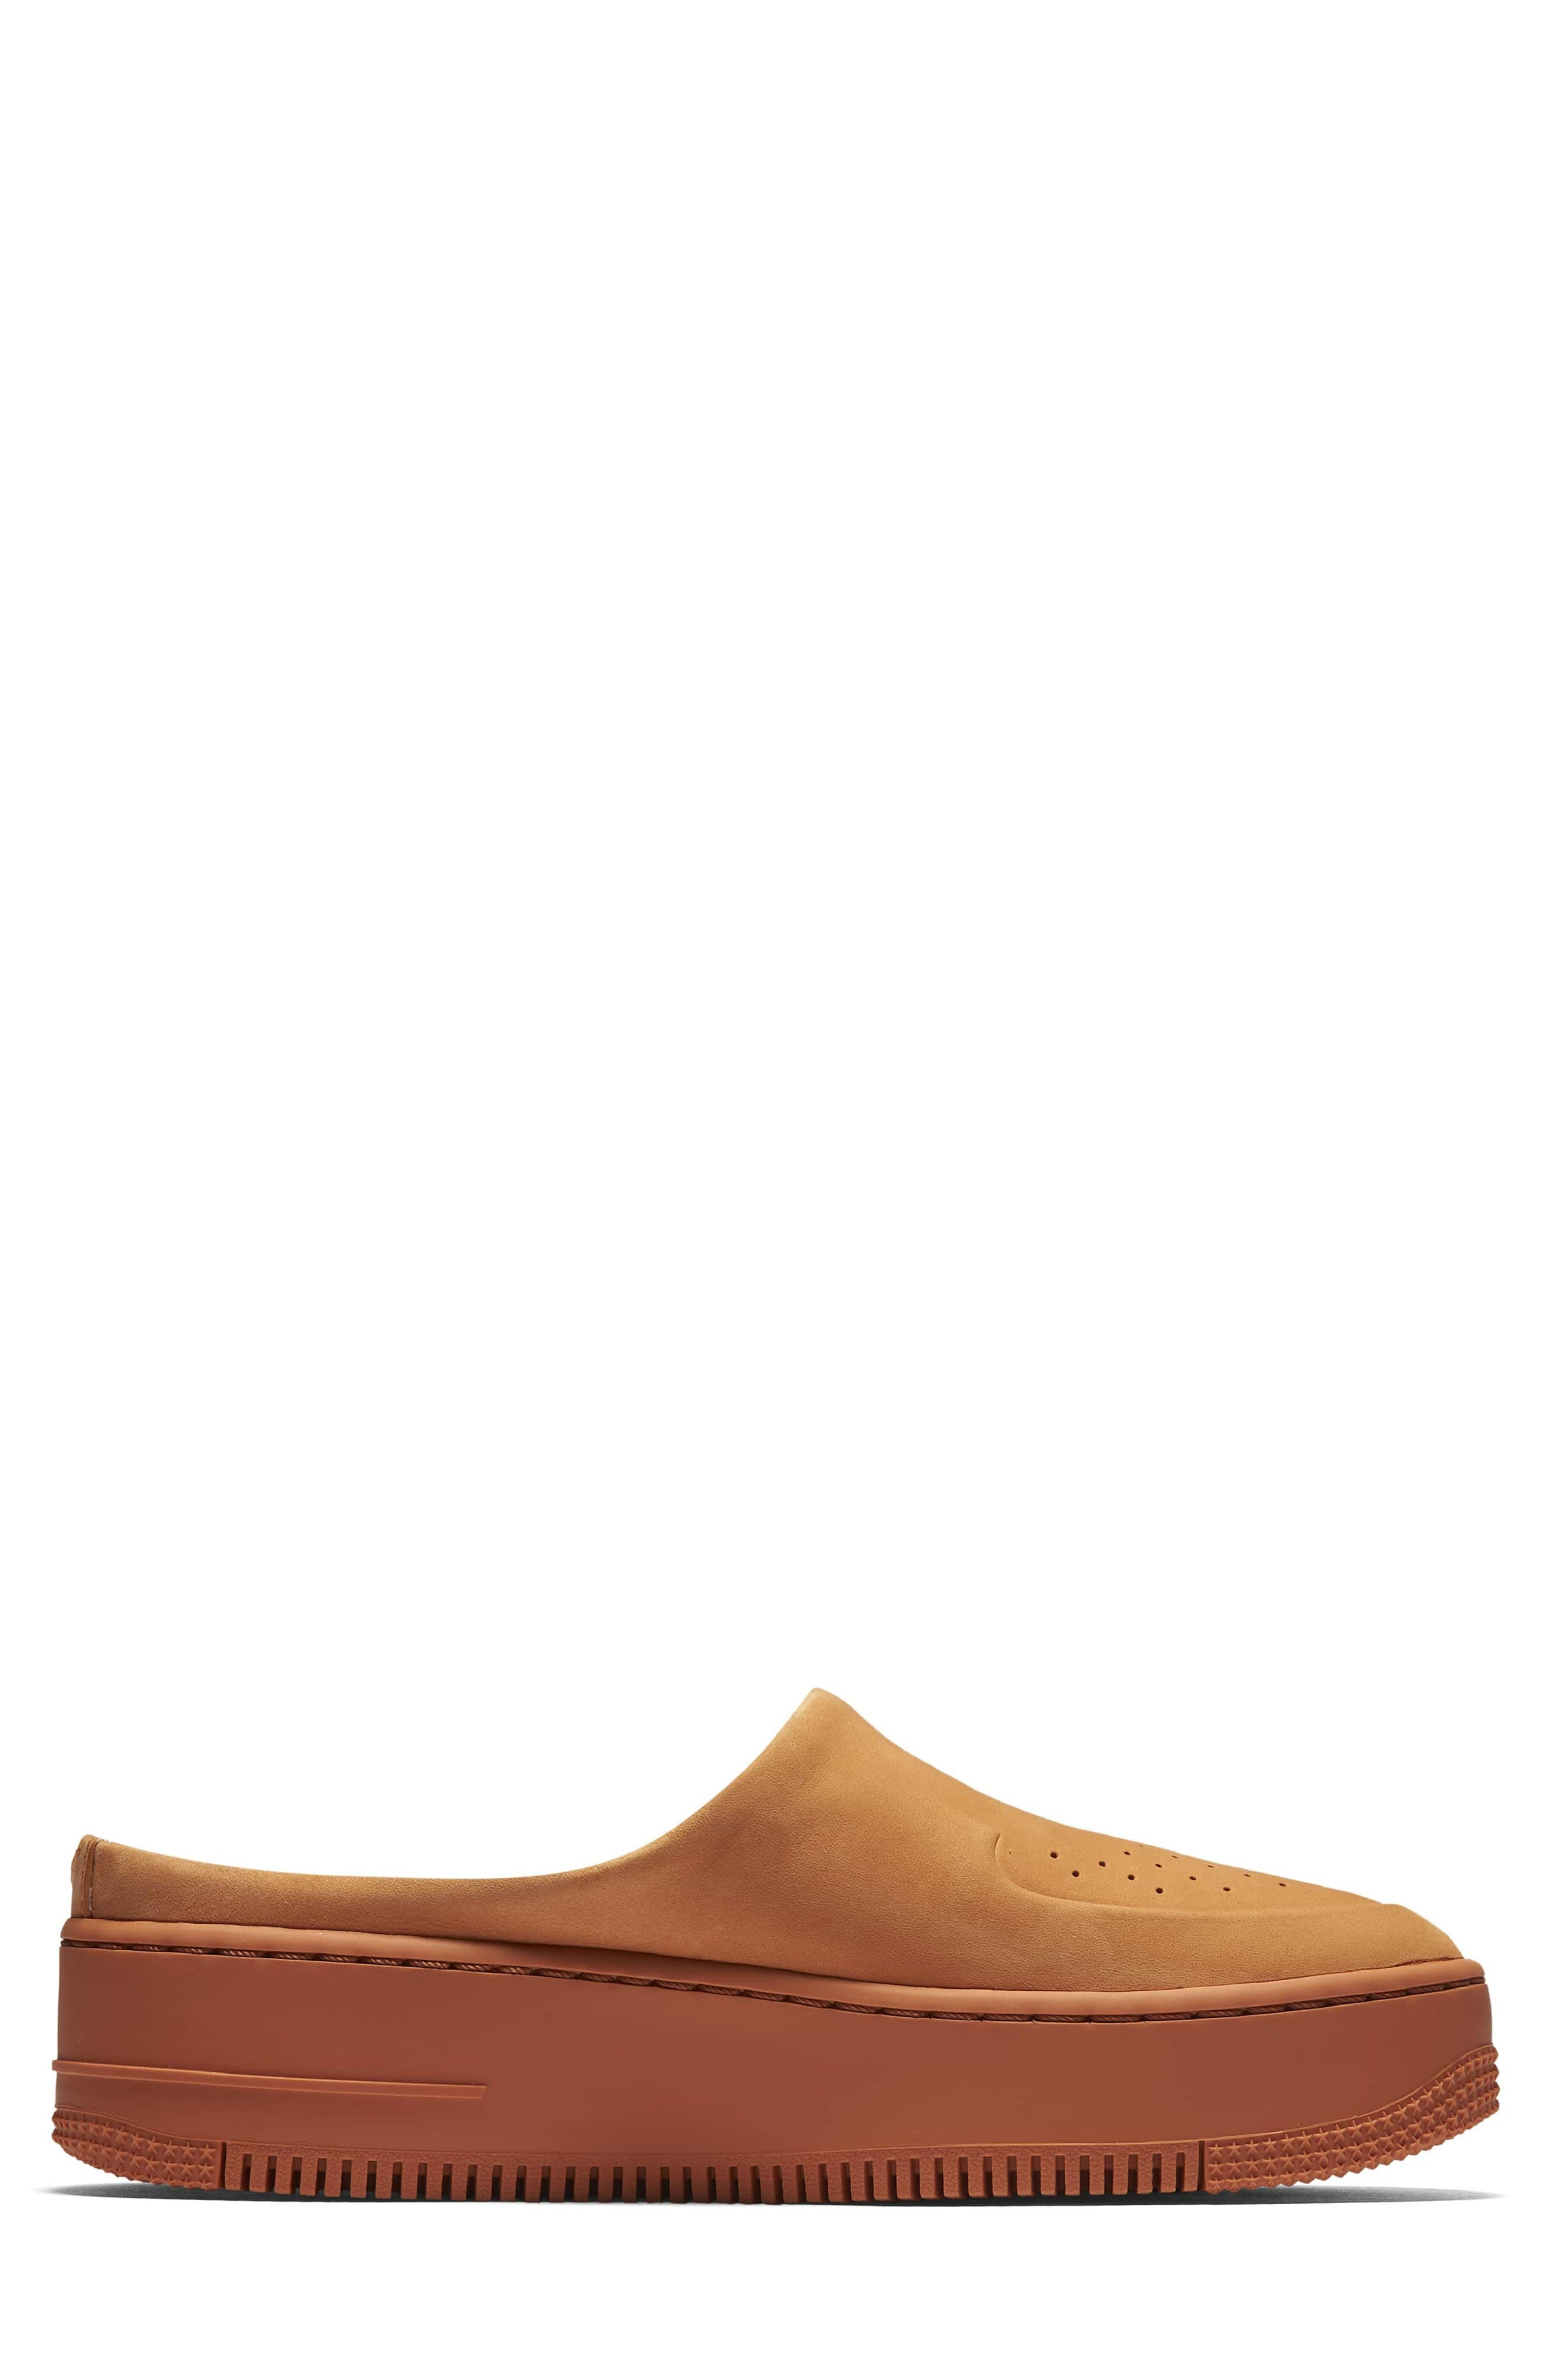 Air Force 1 Lover XX Slip-On Mule Sneaker,                             Alternate thumbnail 6, color,